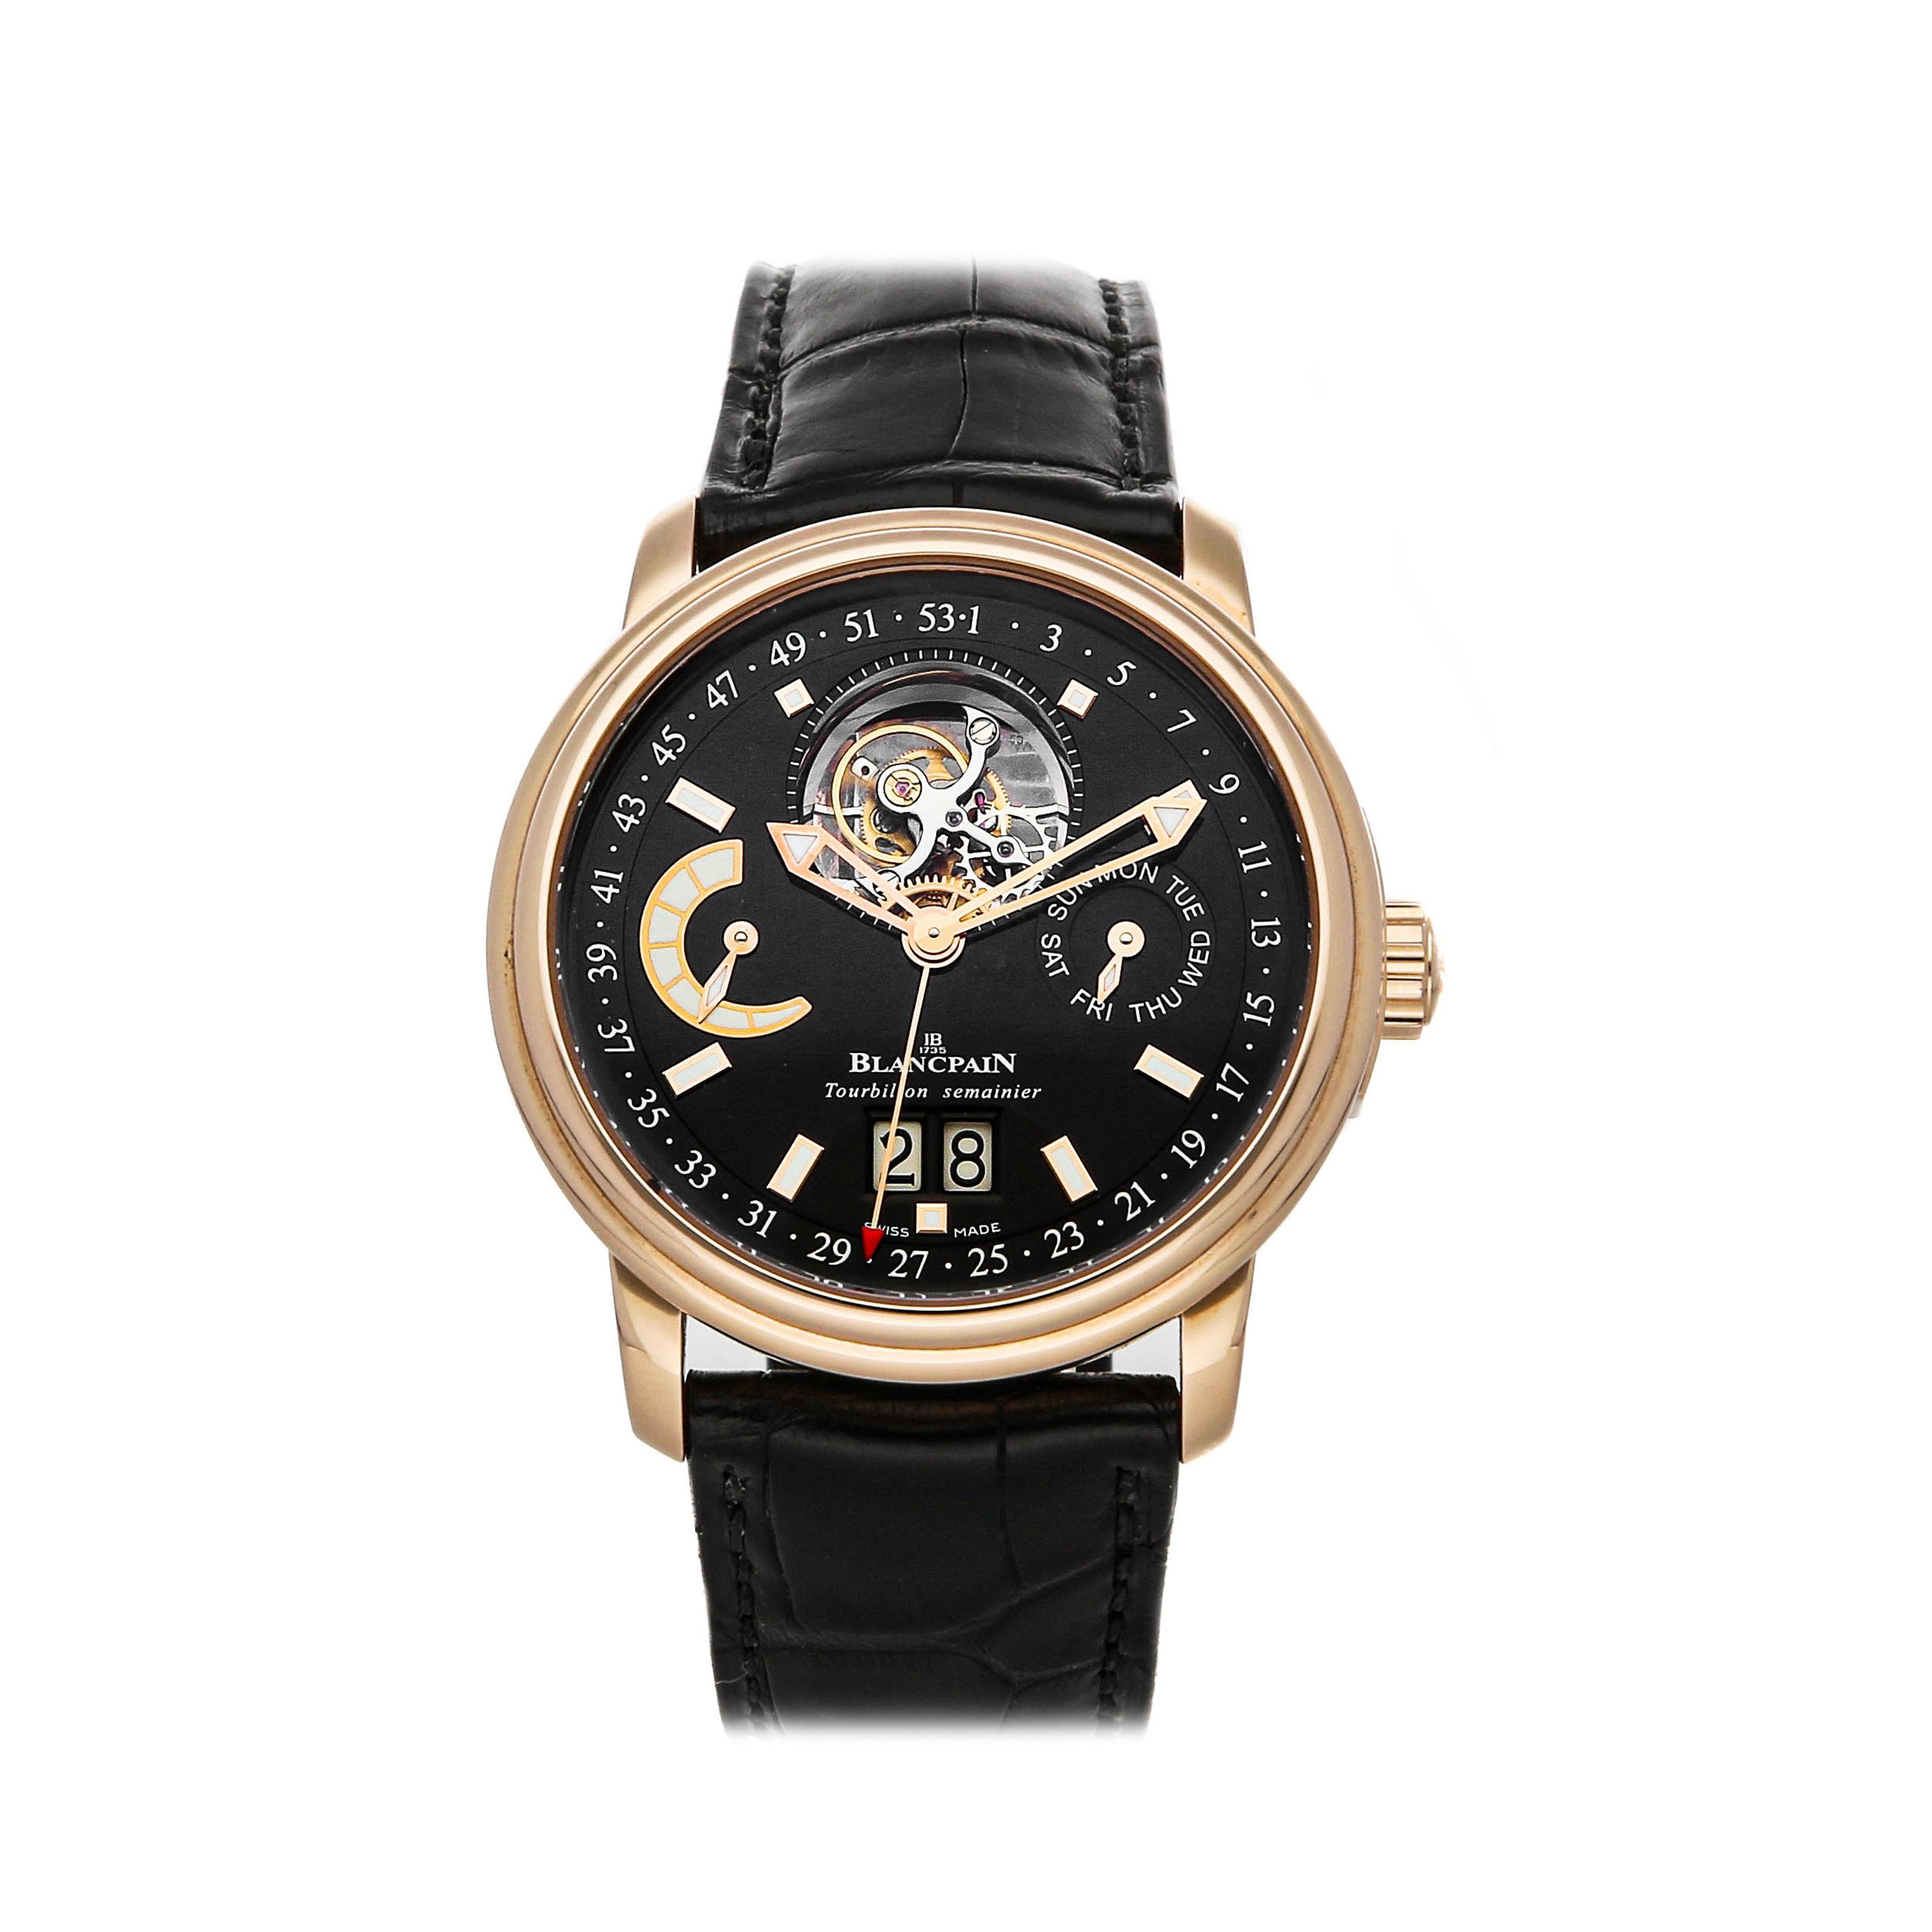 Barington Louisiane montres braceletVERITABLE CROCOVert 35353